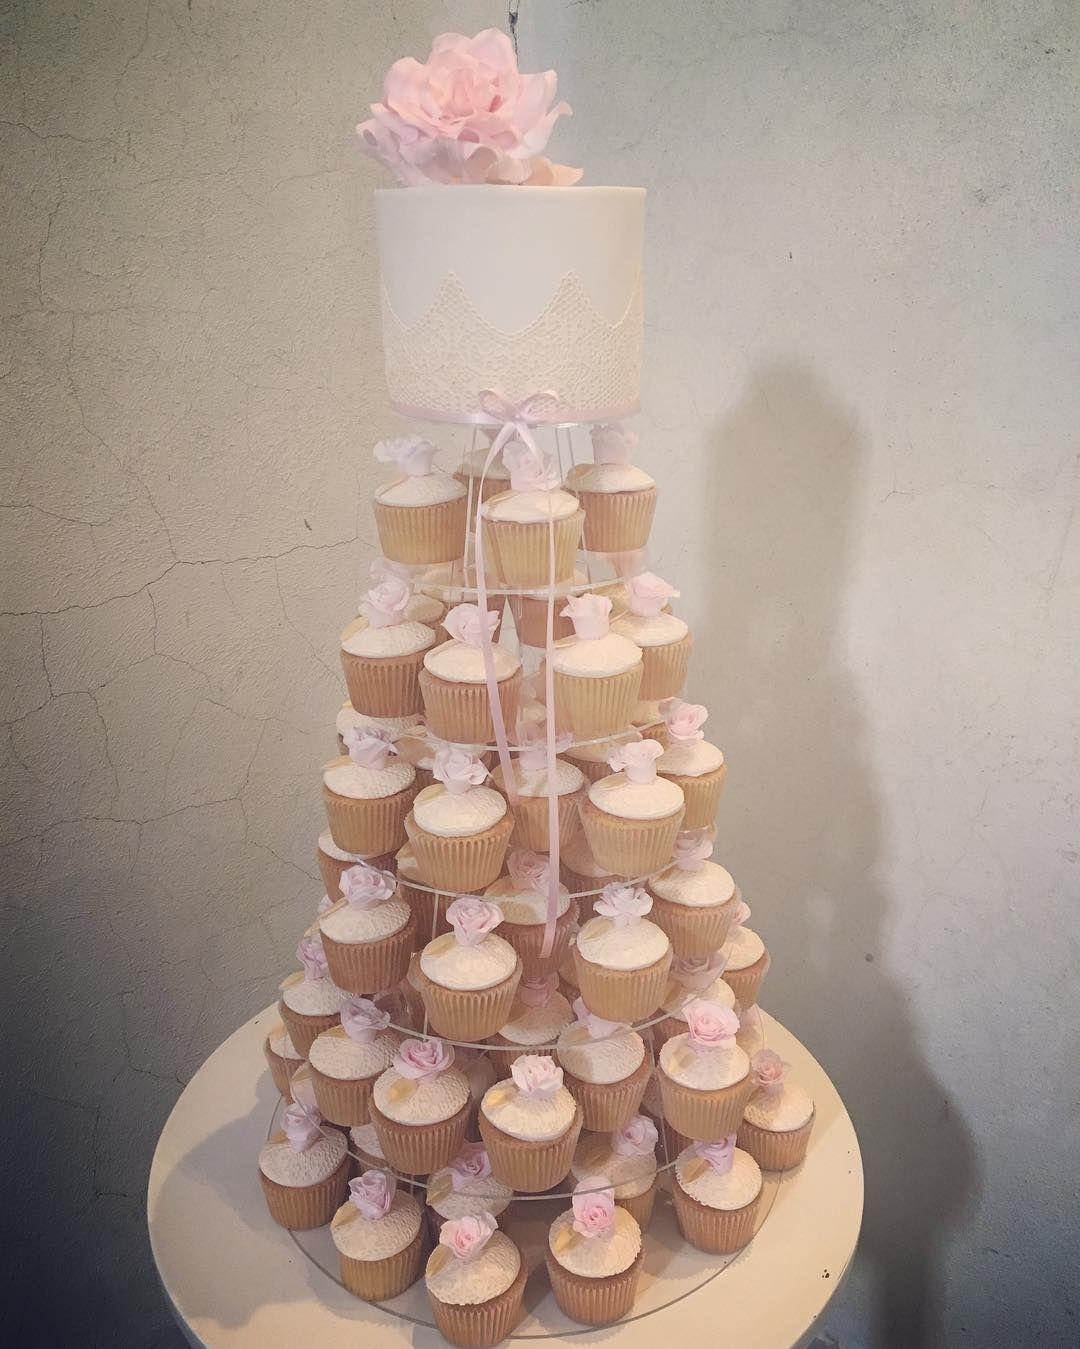 I loved creating this goldandblush cutting cake and cupcake tower